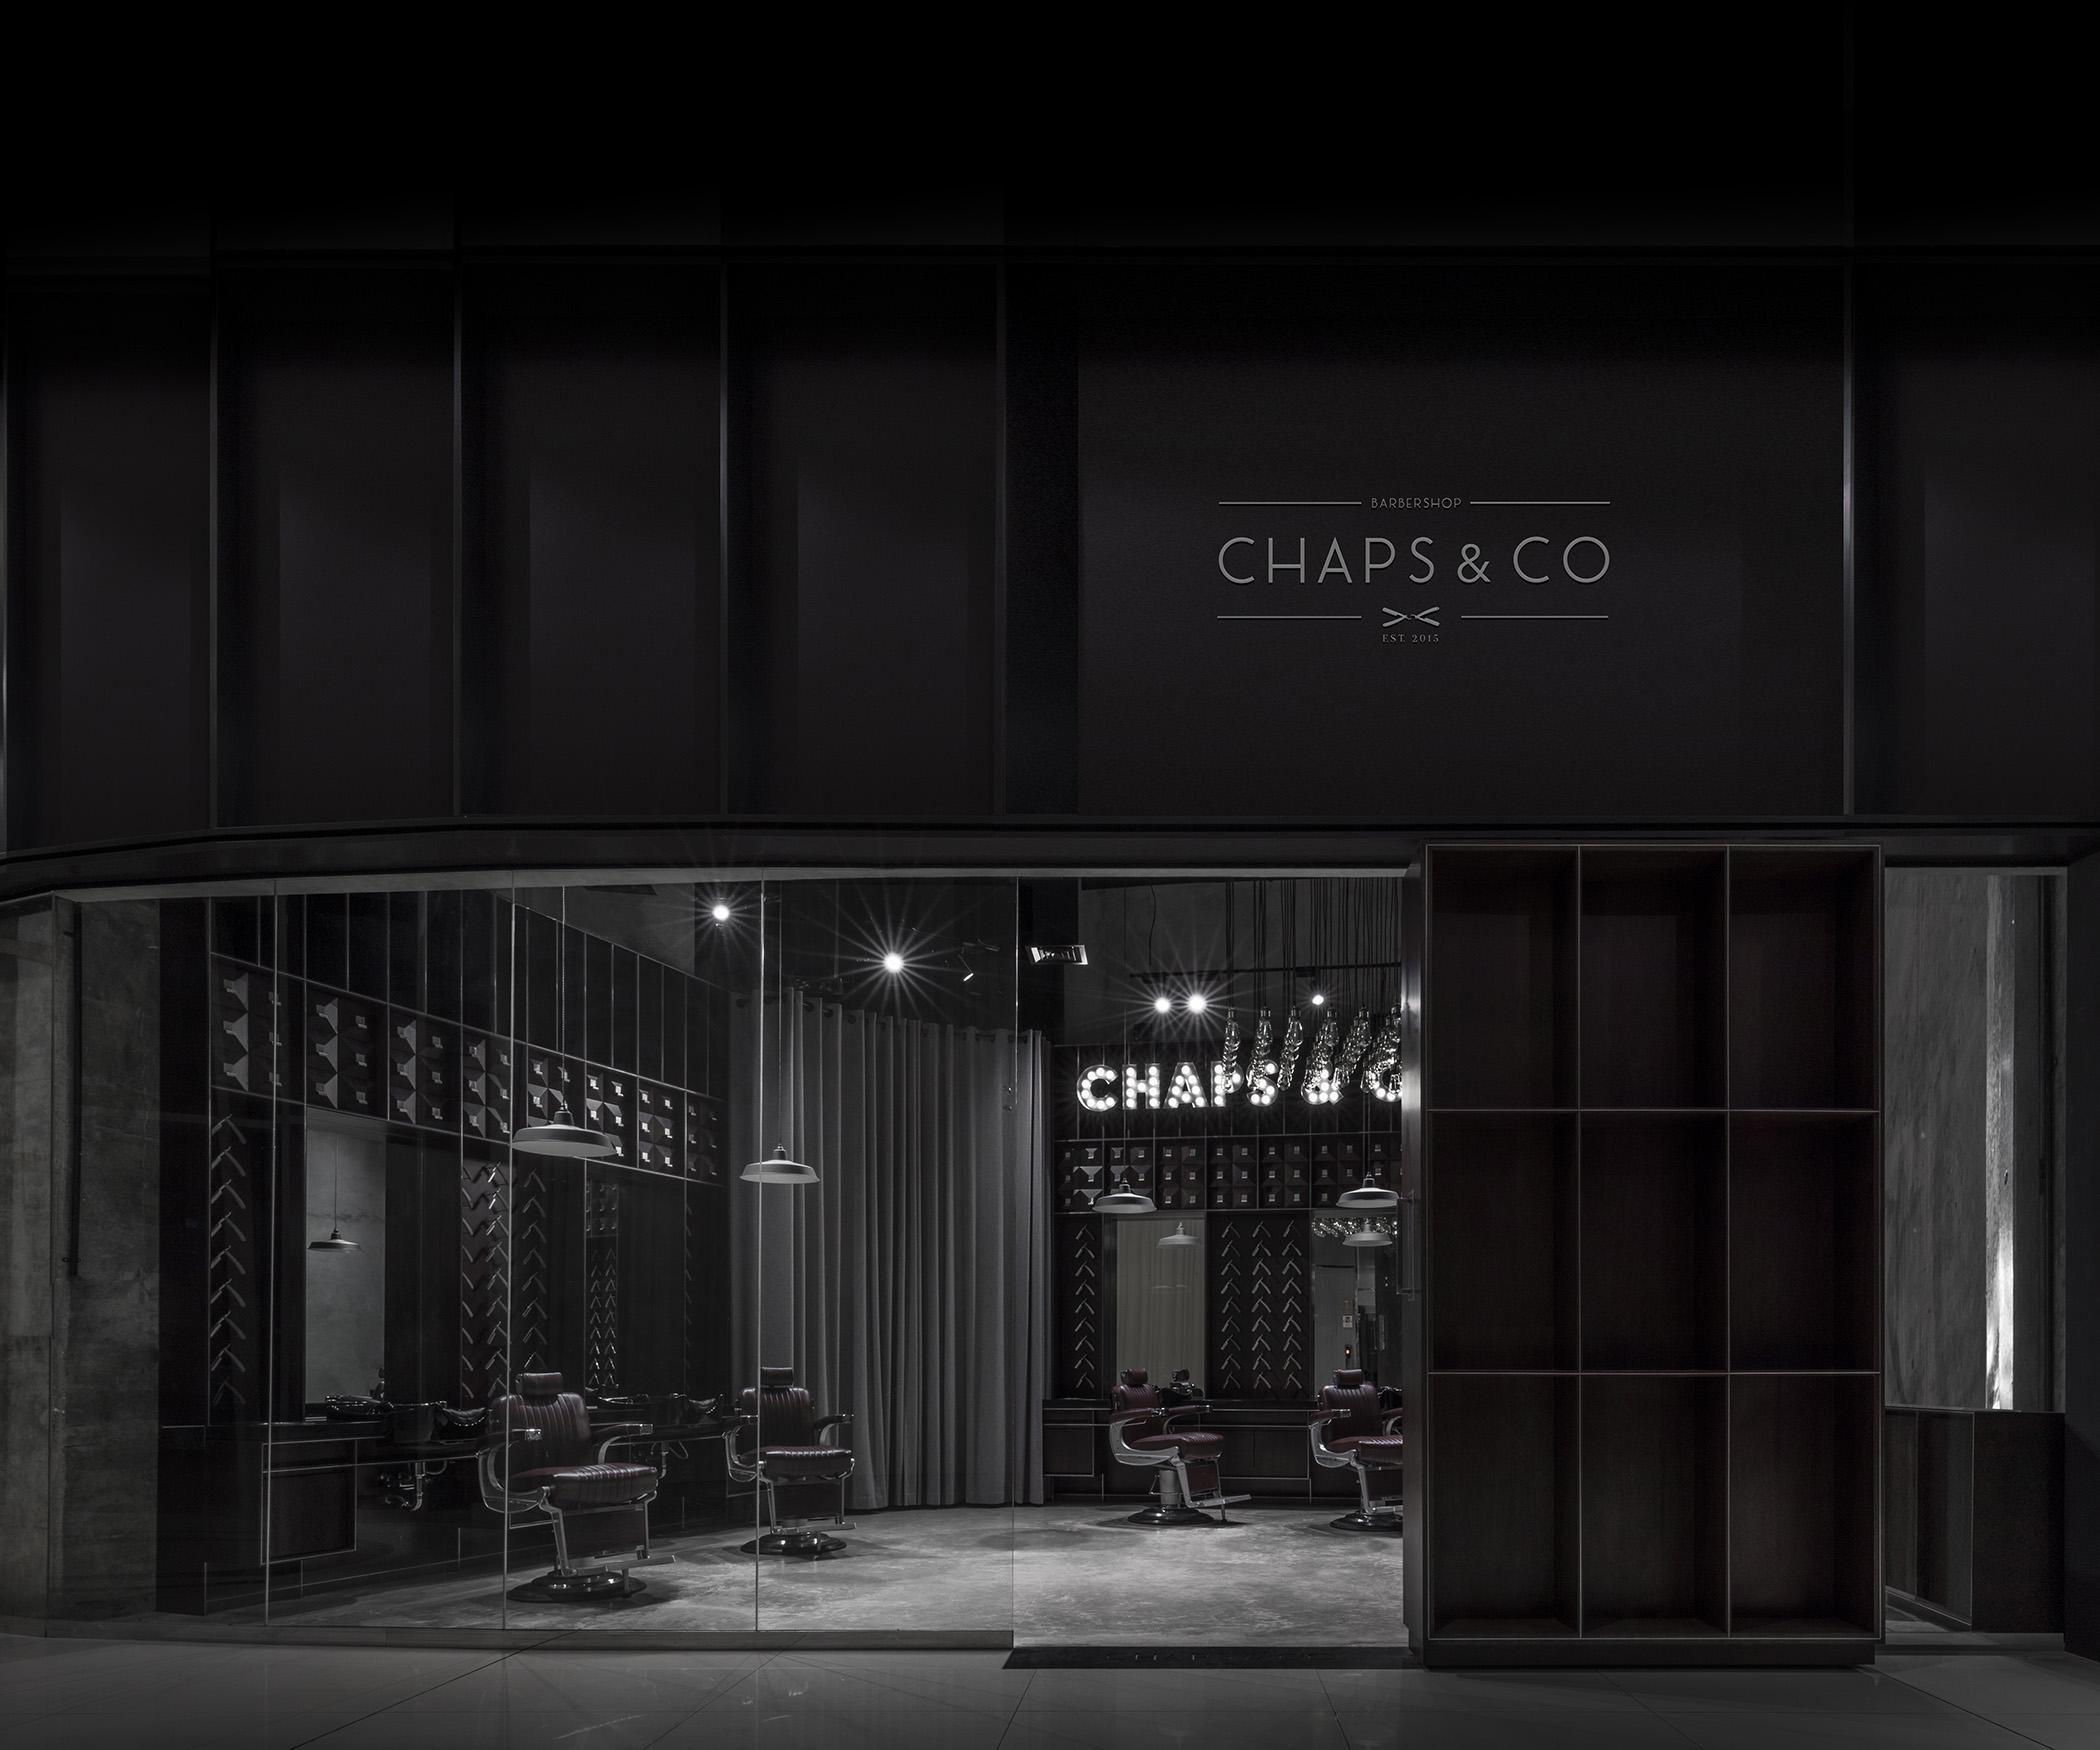 Chaps & Co-Marina-Dubai-Barbershop-Shopfront-Signage-Design-Interior-Architect.jpg